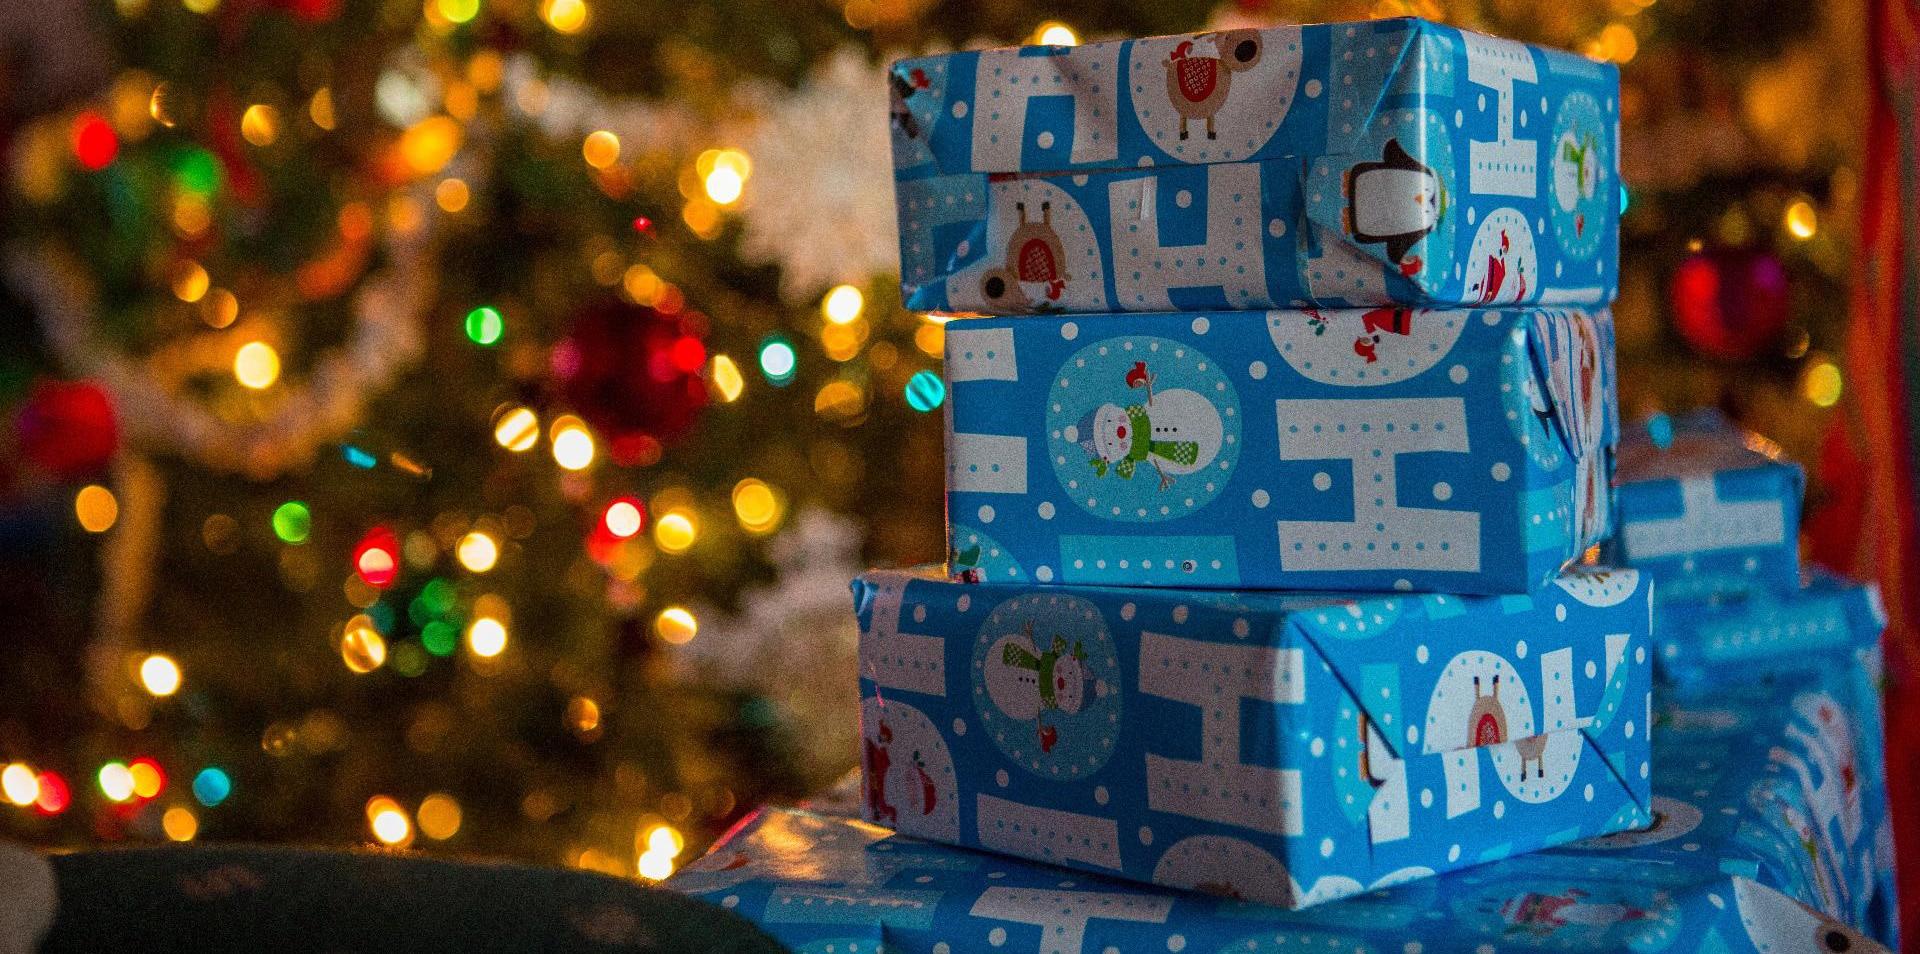 Anodyne juleudsalg - Spar 25% på alle varer.